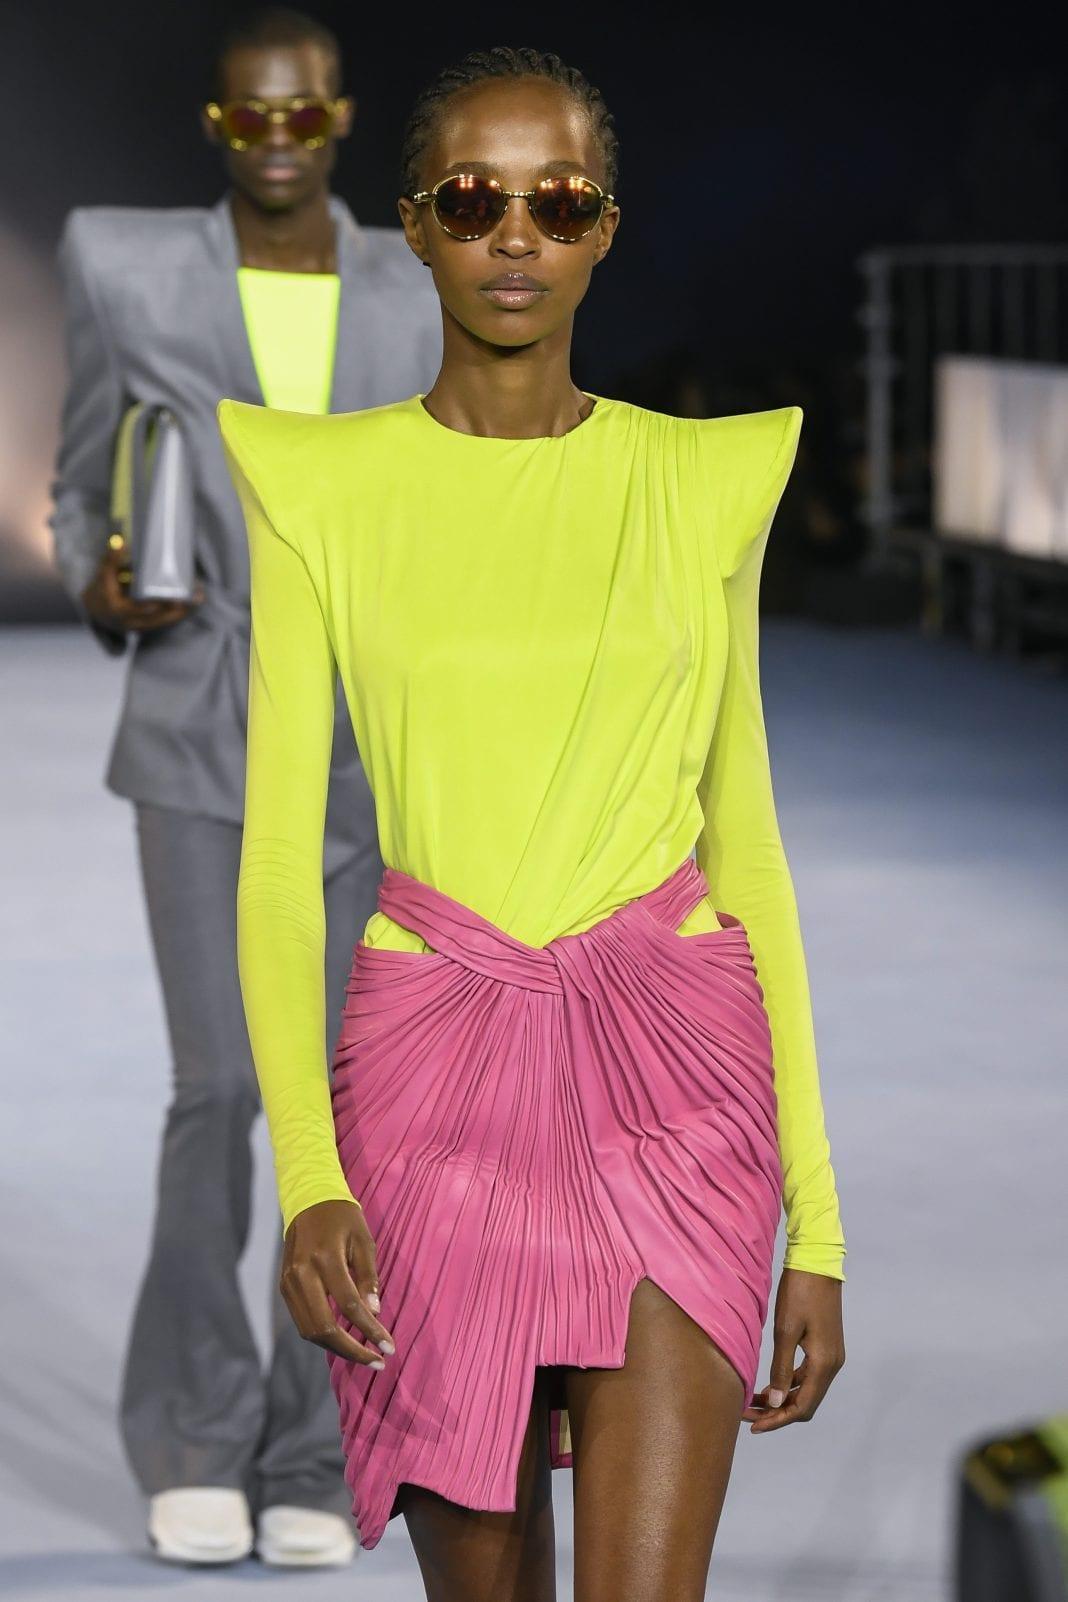 Bold shoulders: Οι έντονοι ώμοι είναι η νέα τάση που είδαμε στα ντεφιλέ των πιο διάσημων σχεδιαστών